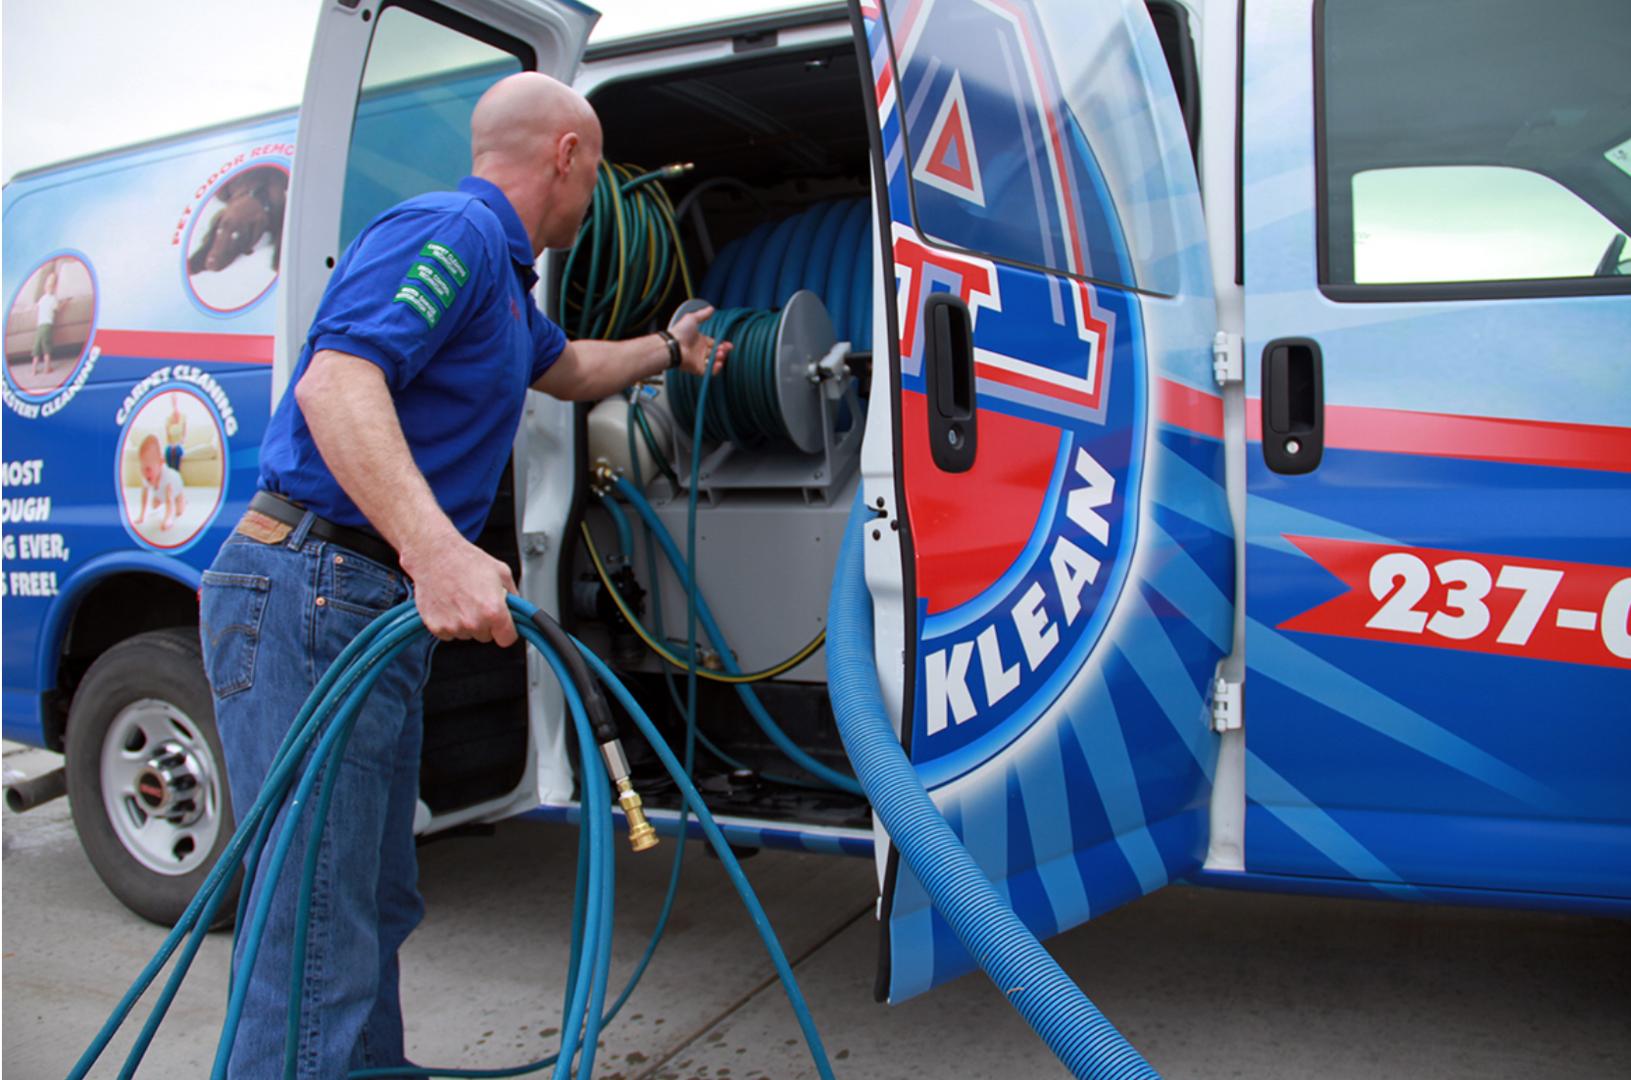 AA Super Klean best carpet cleaners in Casper, Wyoming